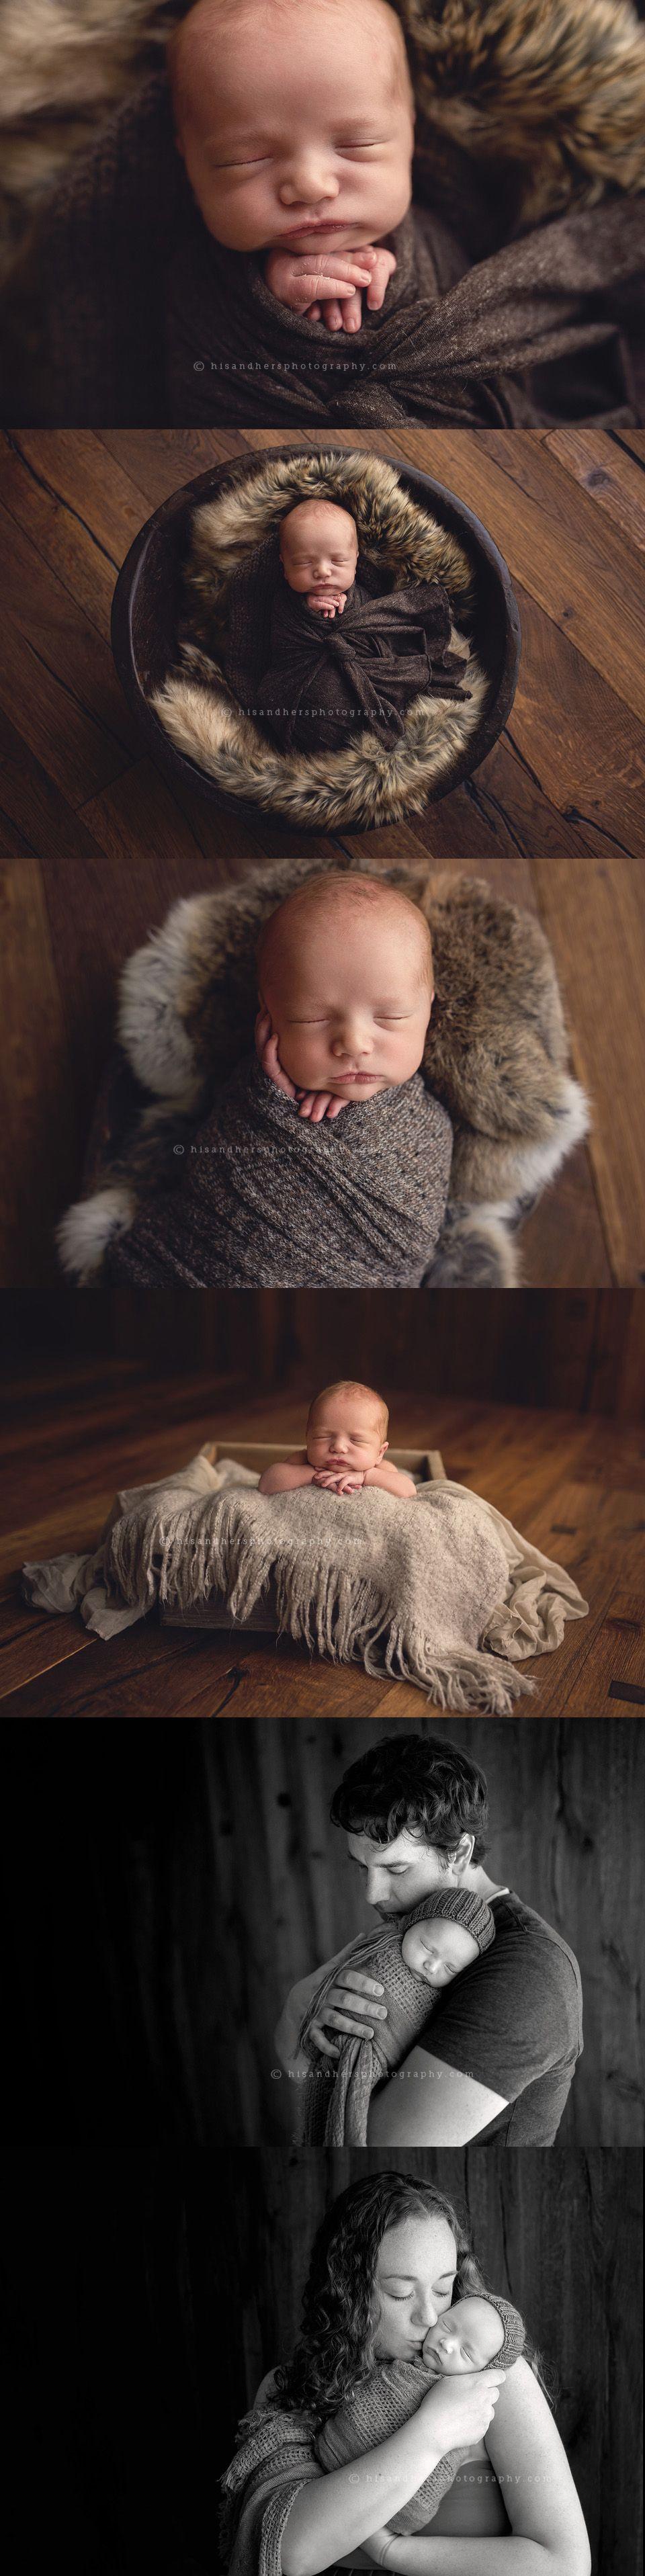 des moines waukee adel newborn photographer newborn photography studio pictures best des moines photographer